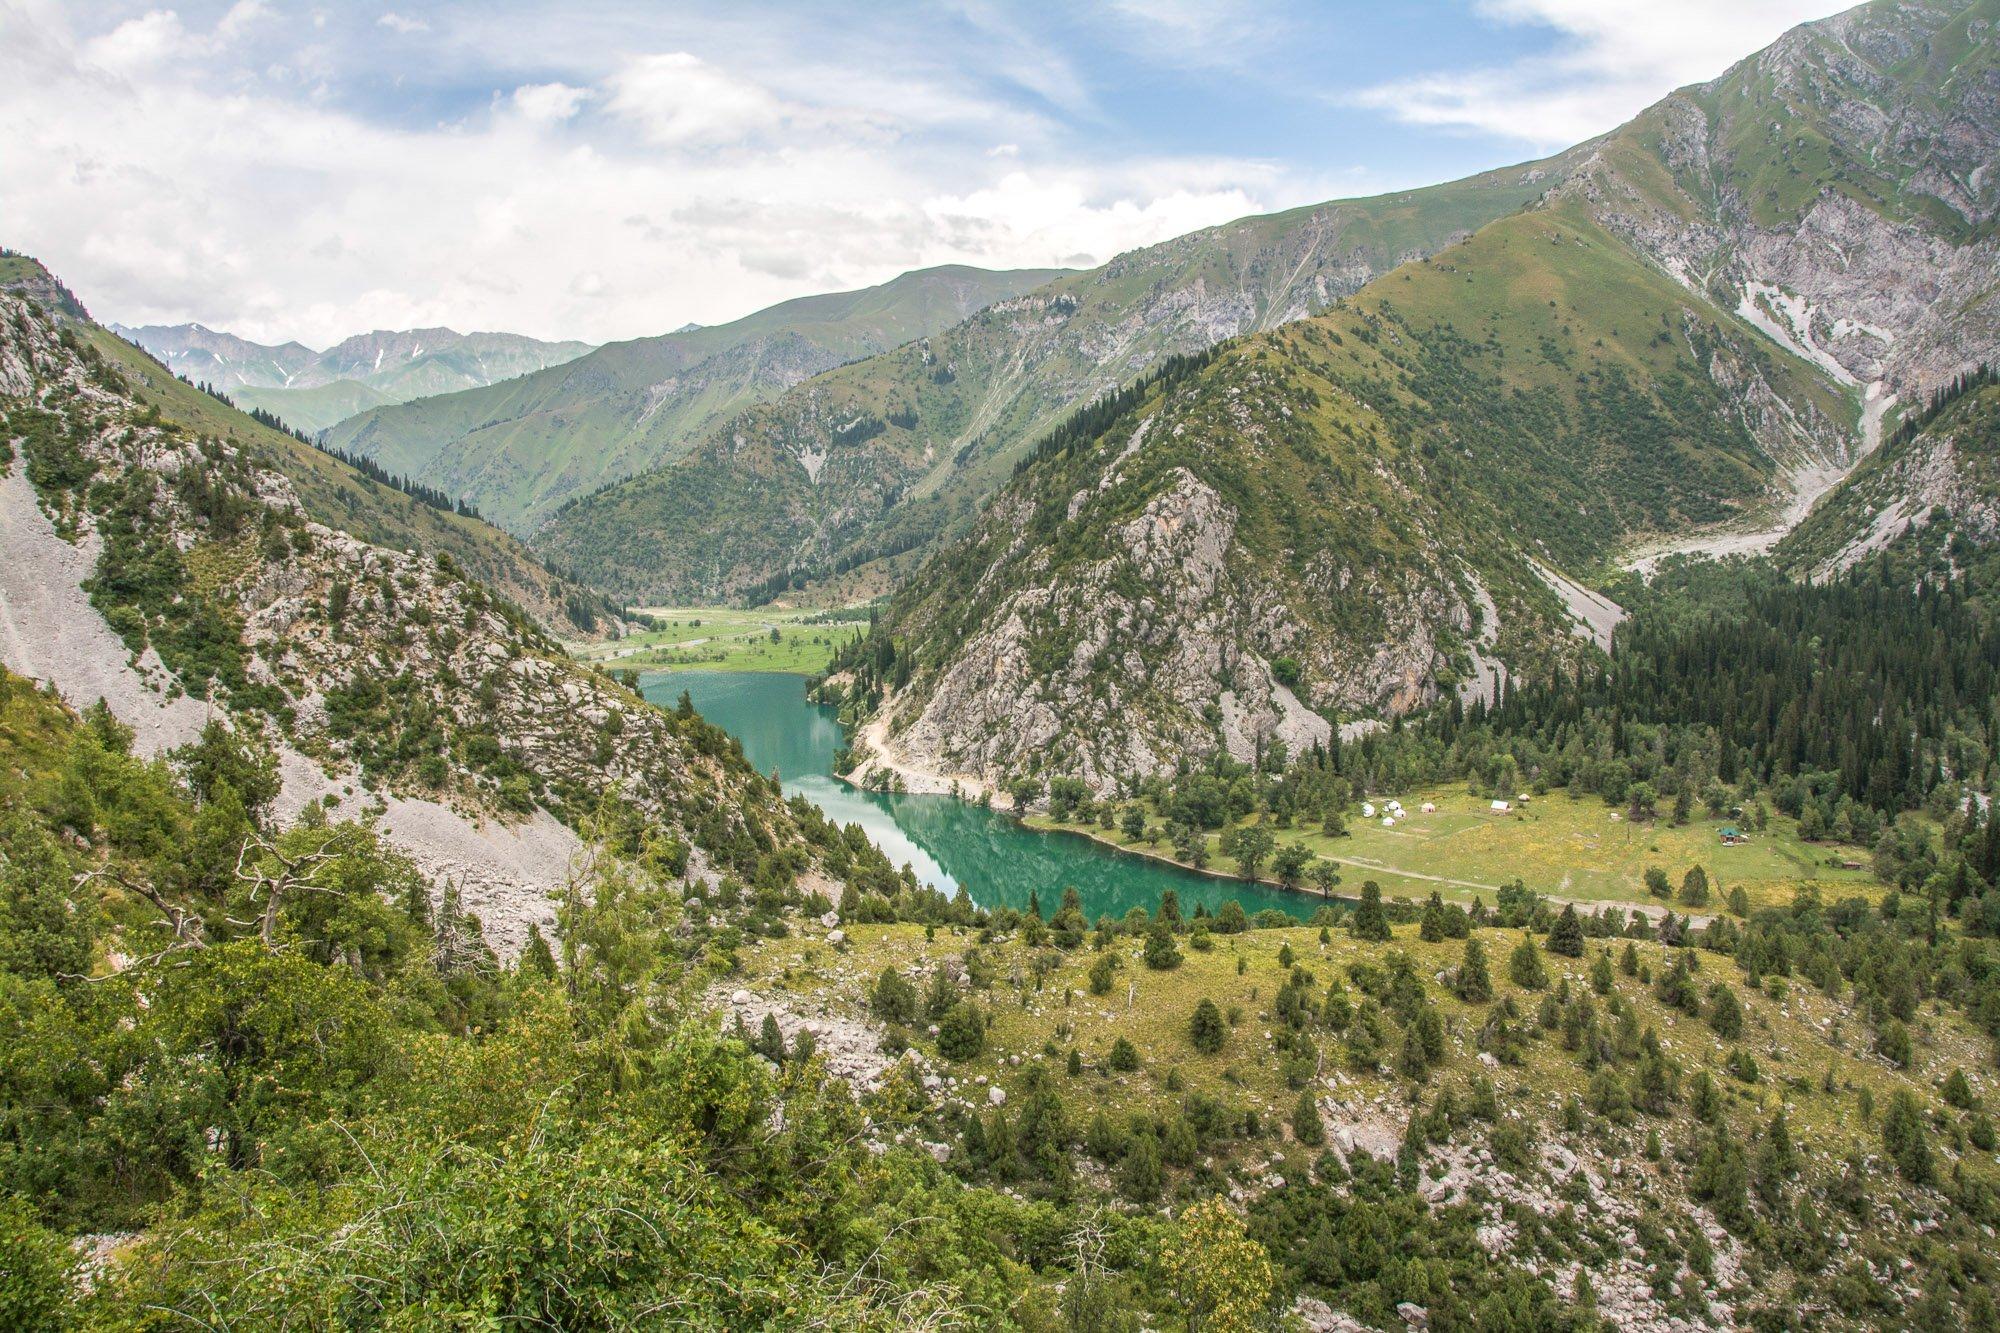 Exploring Sary-Chelek on Horseback Tour, Kara-Kamysh Lake - Jalal-Abad Region, Kyrgyzstan